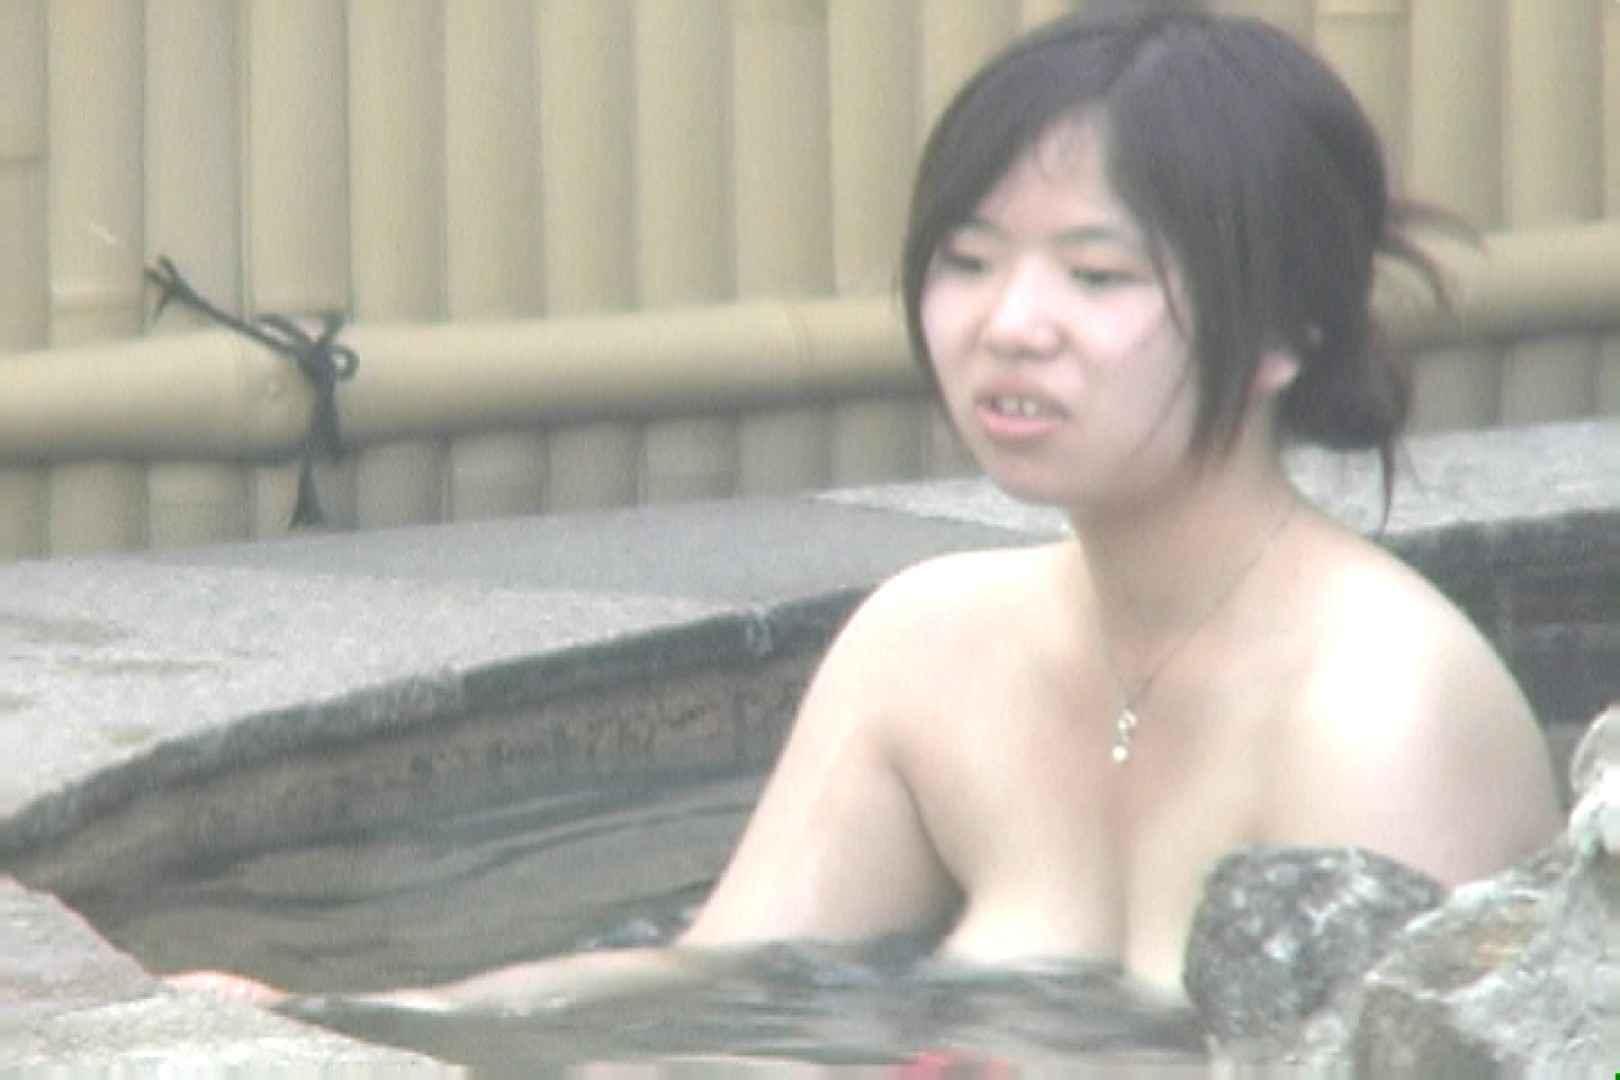 Aquaな露天風呂Vol.689 盗撮  50連発 33